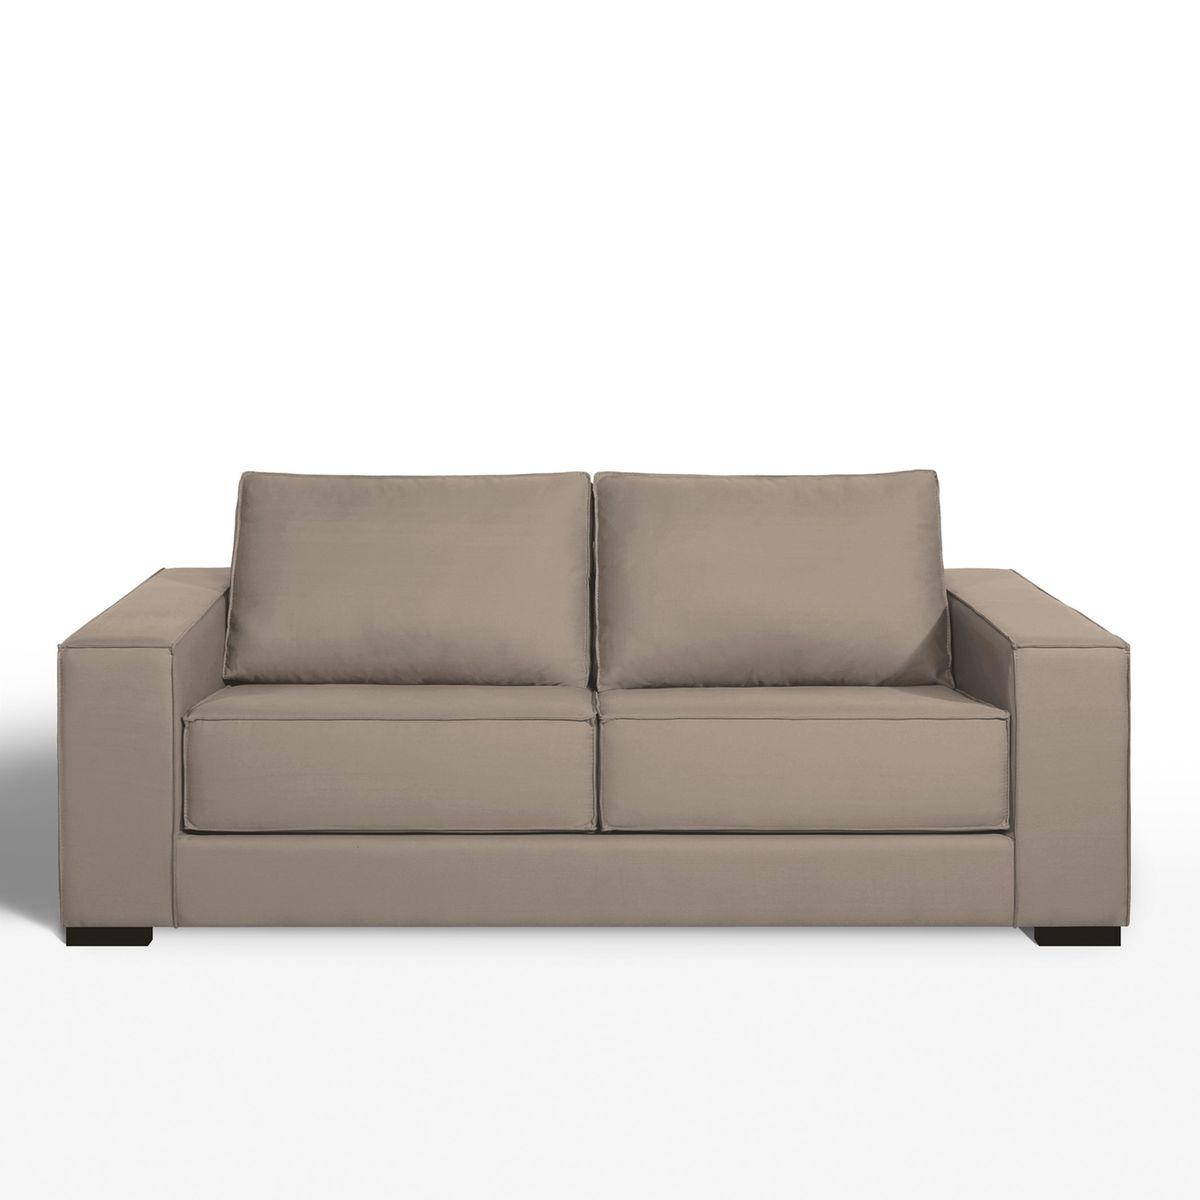 canape assise profonde jusqu 50 soldes deuxi me. Black Bedroom Furniture Sets. Home Design Ideas